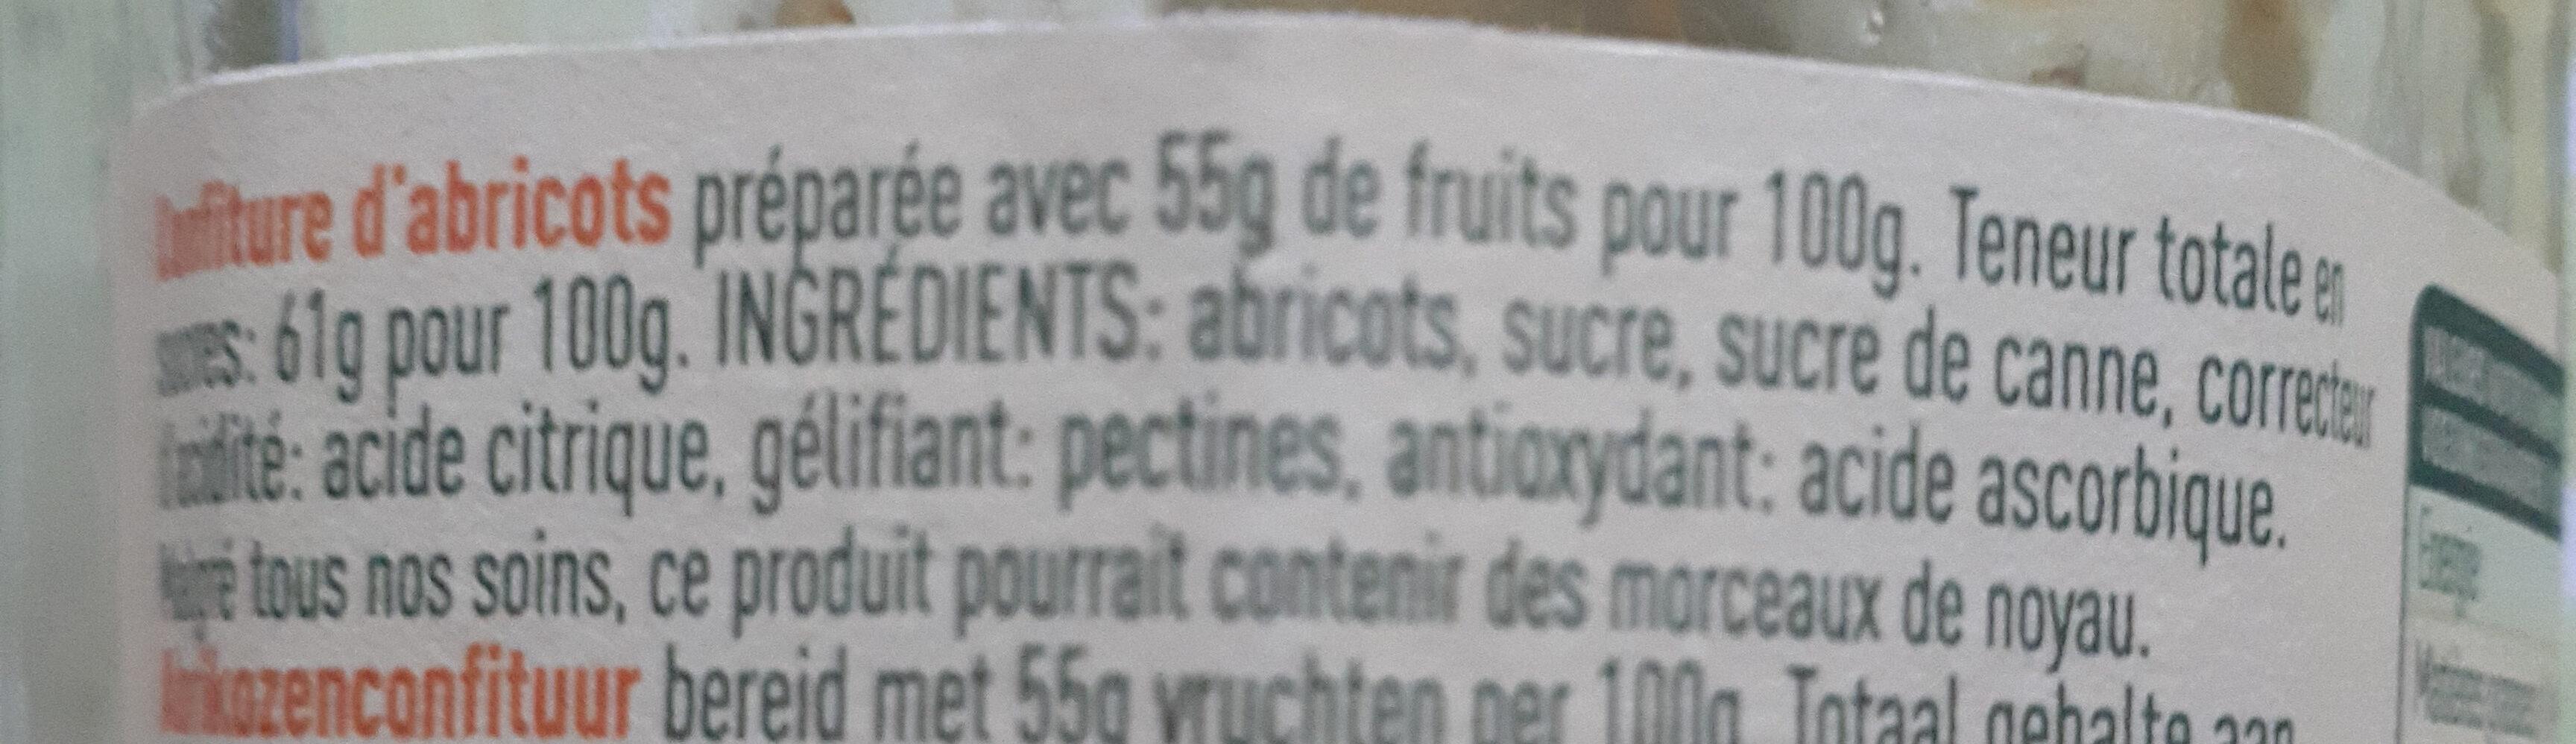 Confiture Abricots - Ingredients - fr